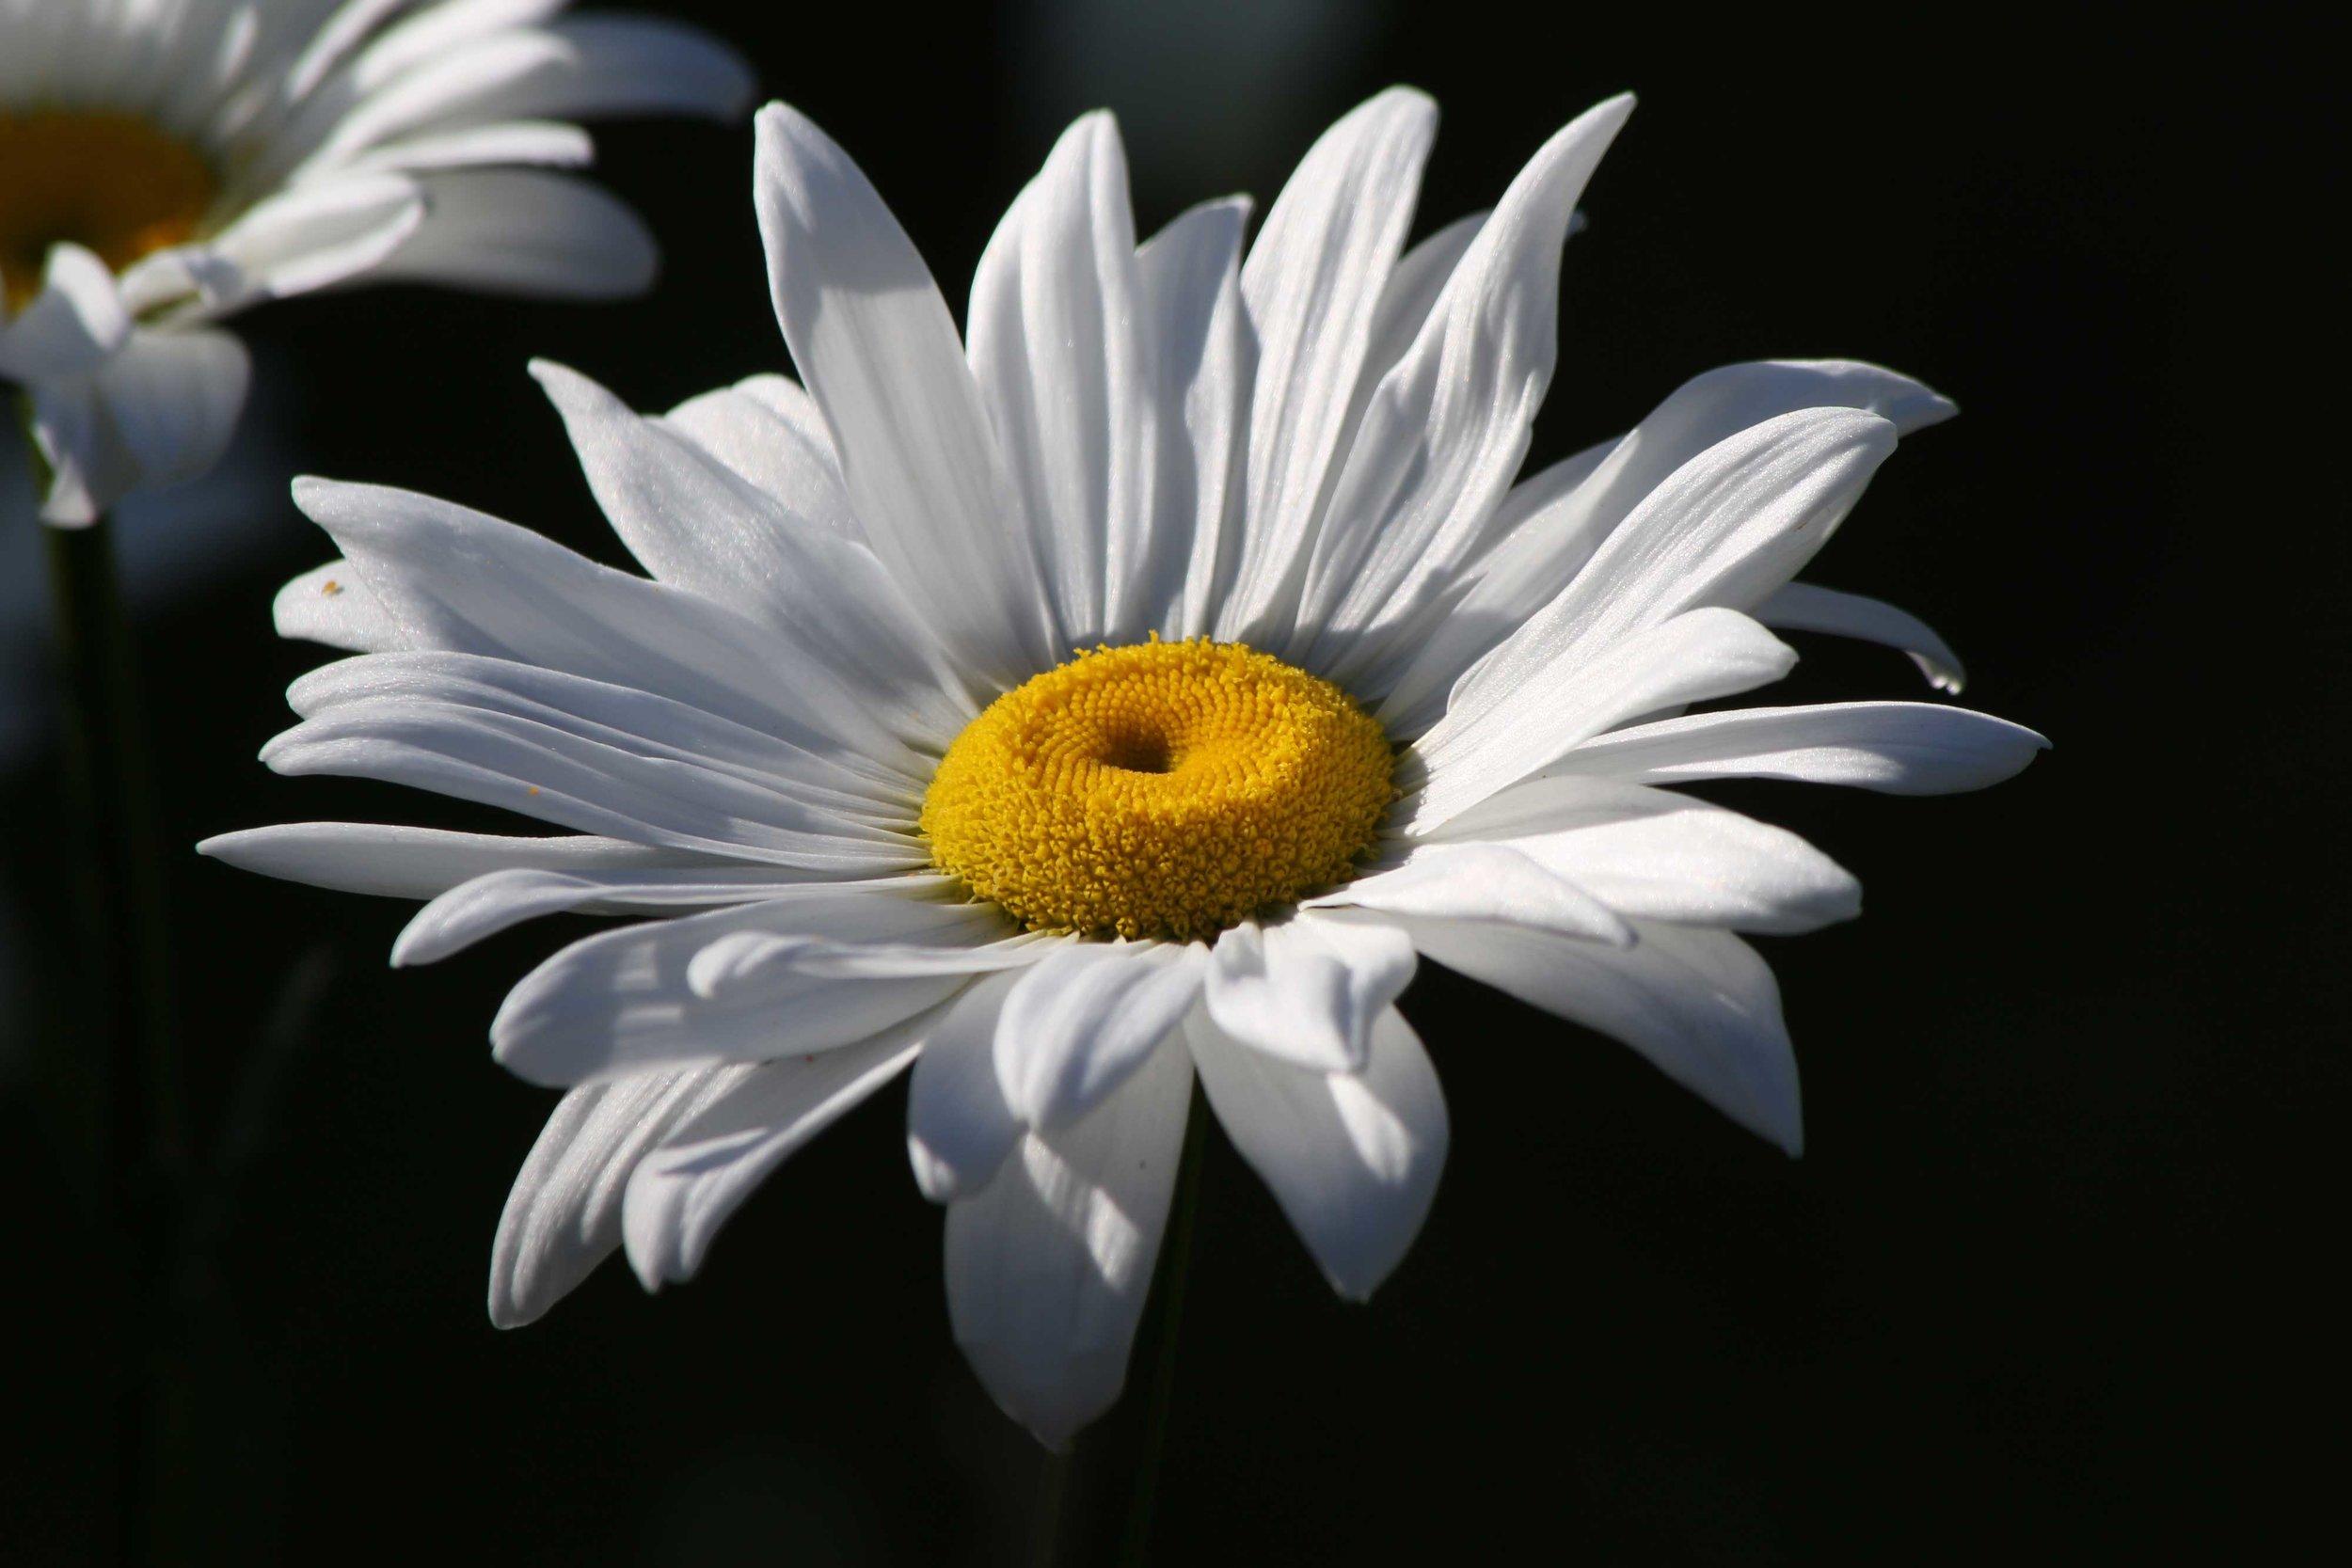 White-Daisy-Black-Background_web.jpg